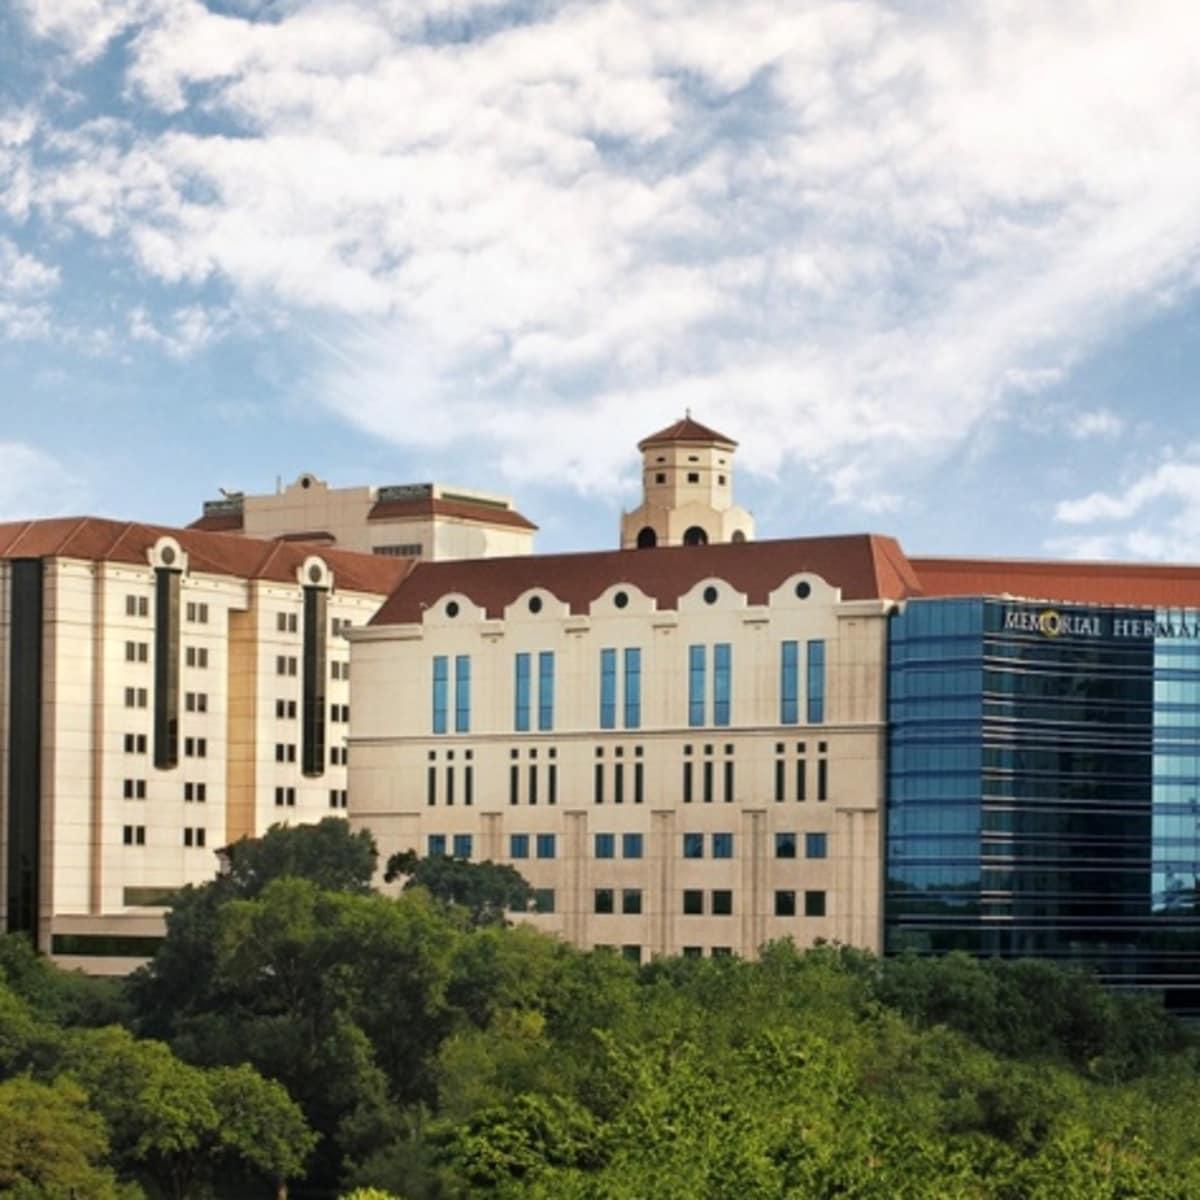 News_Memorial Hermann_Texas Medical Center_campus_hospital